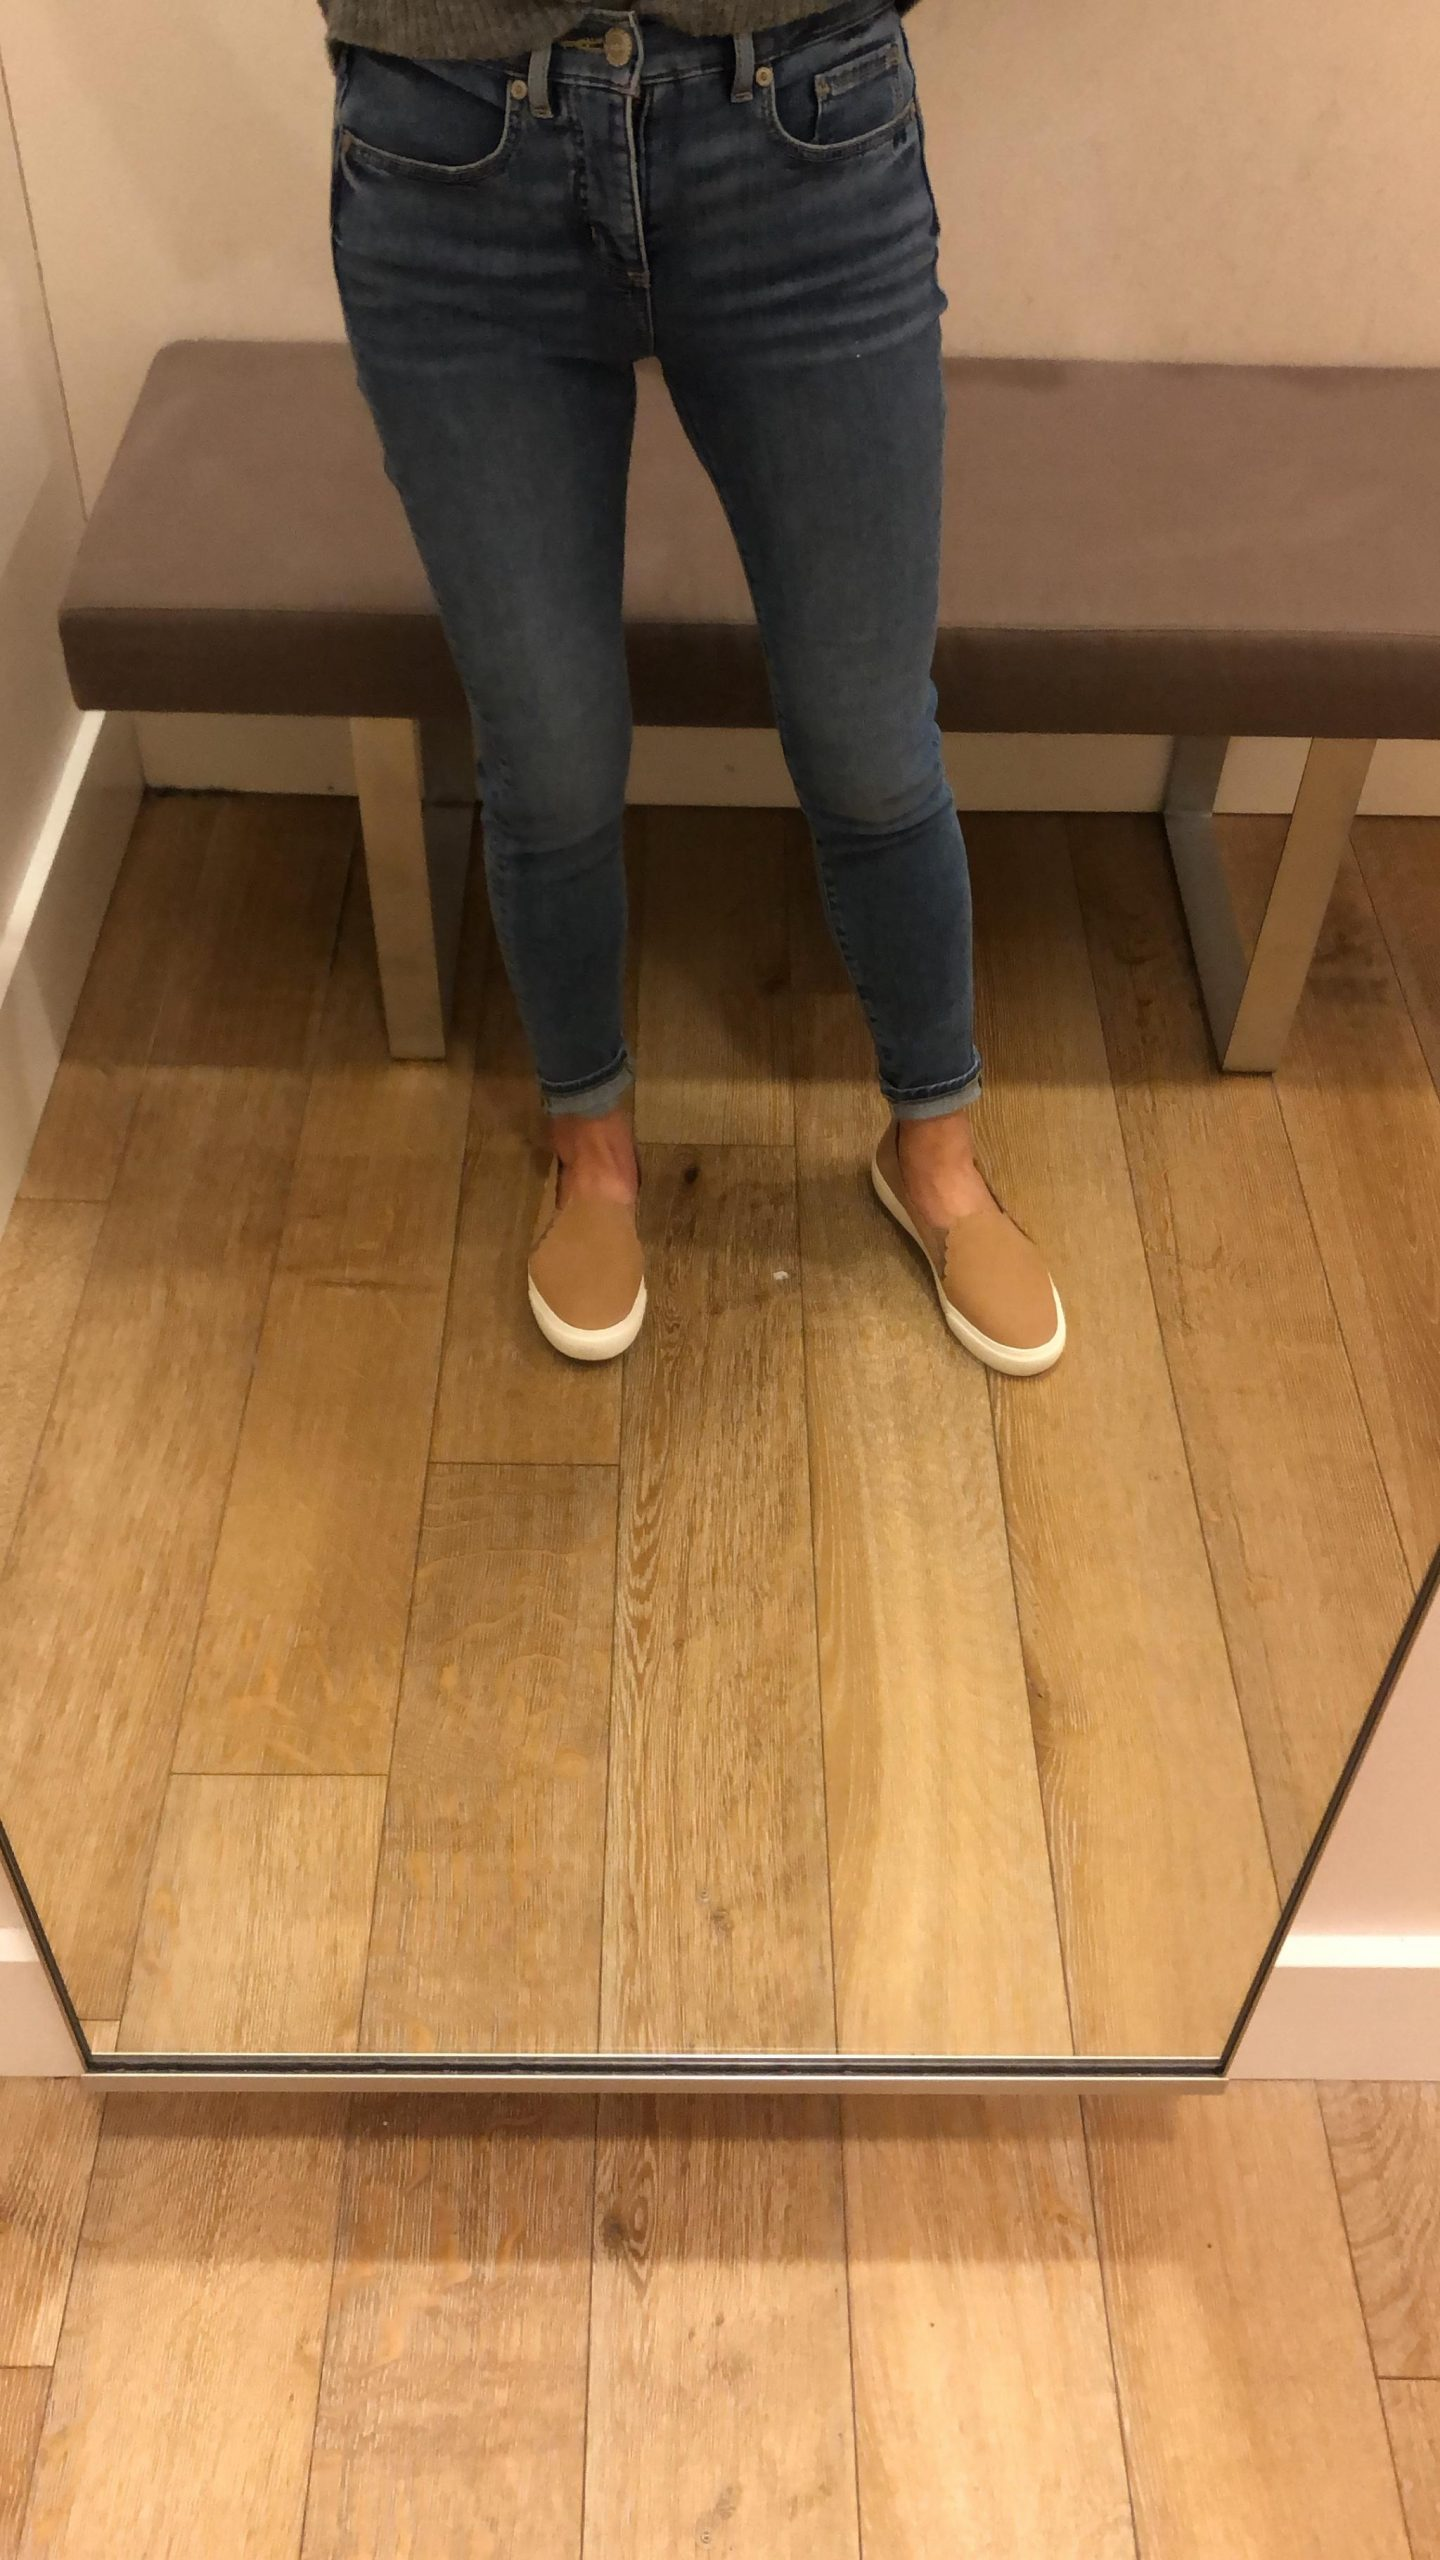 LOFT Modern Soft Skinny Crop Jeans in Pure Mid Indigo Wash, size 25/0P